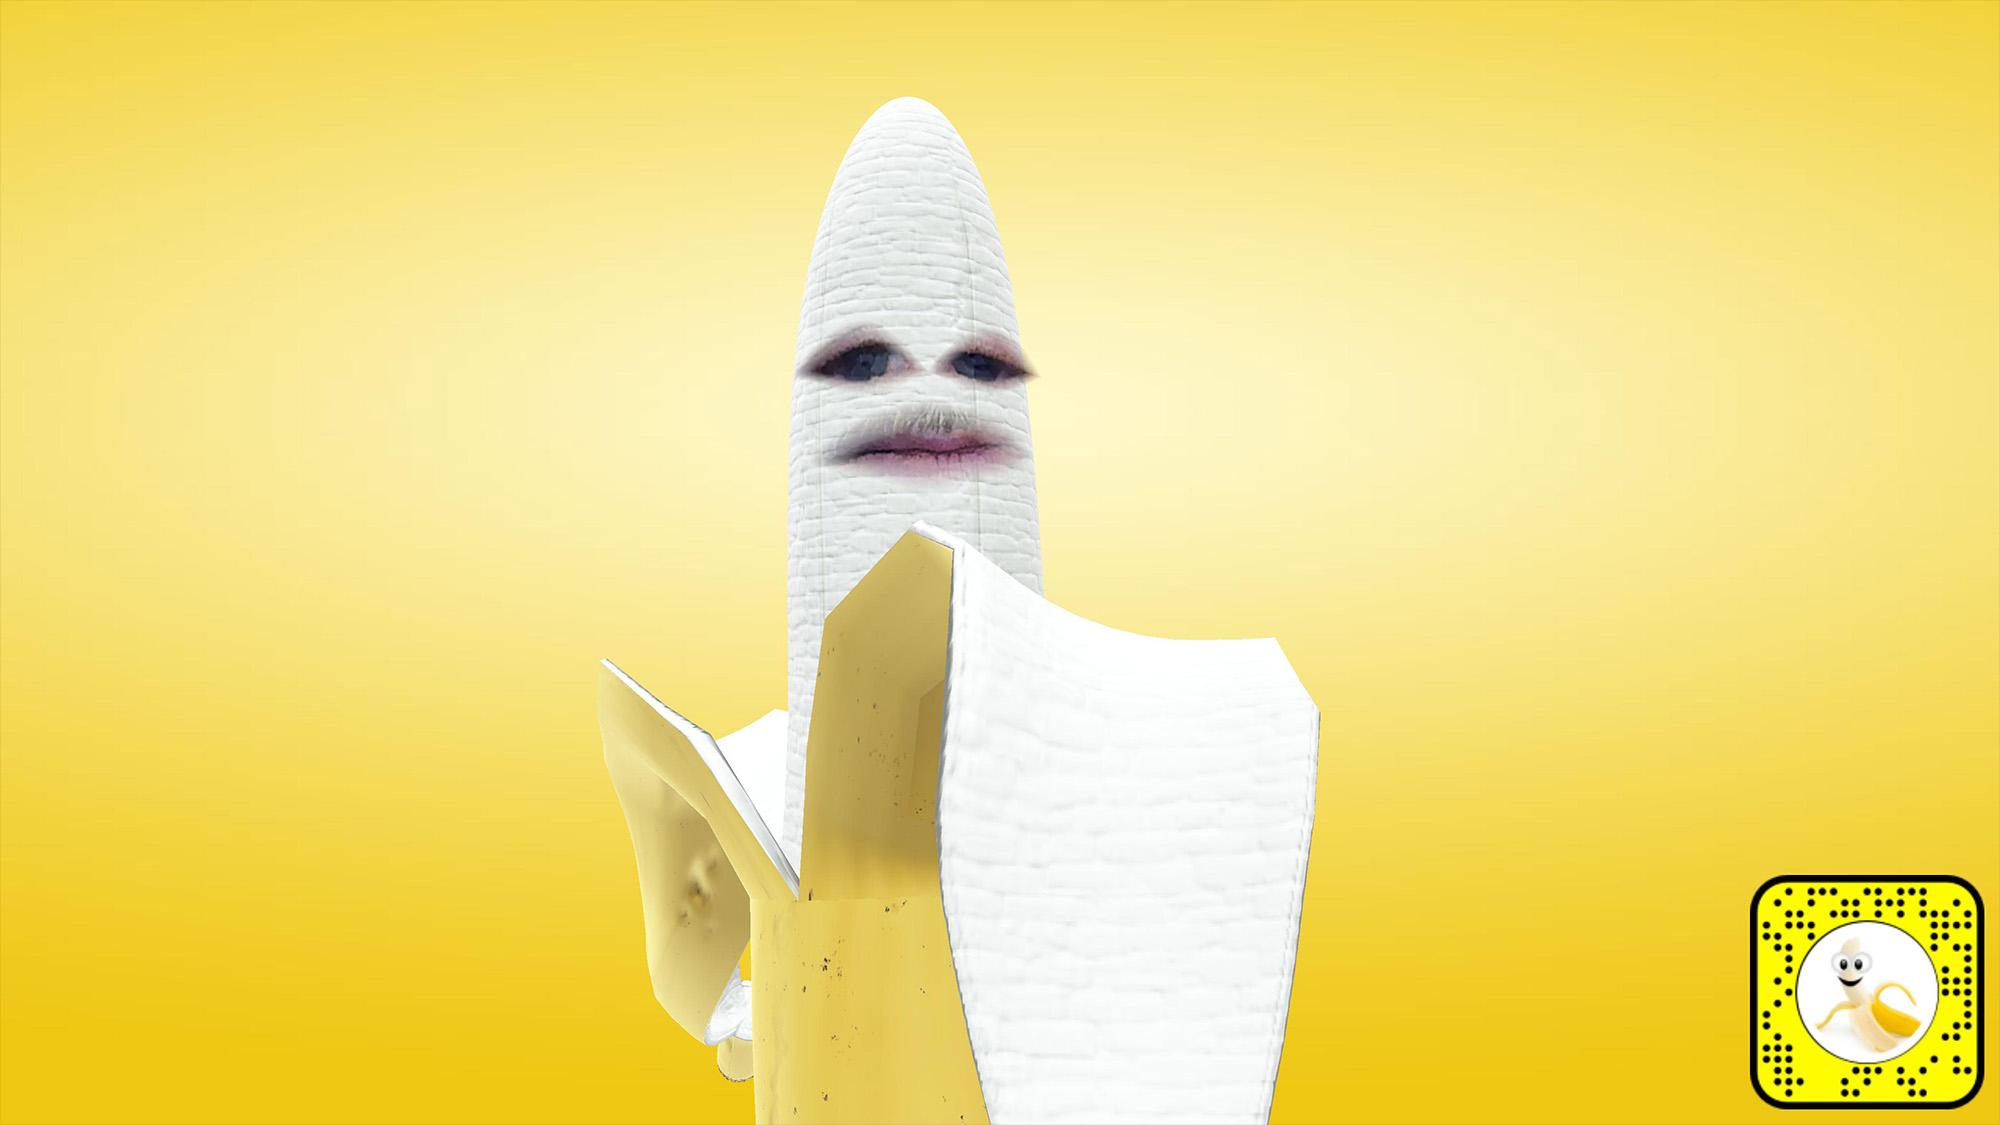 Snap Camera filter lens for a peeled banana